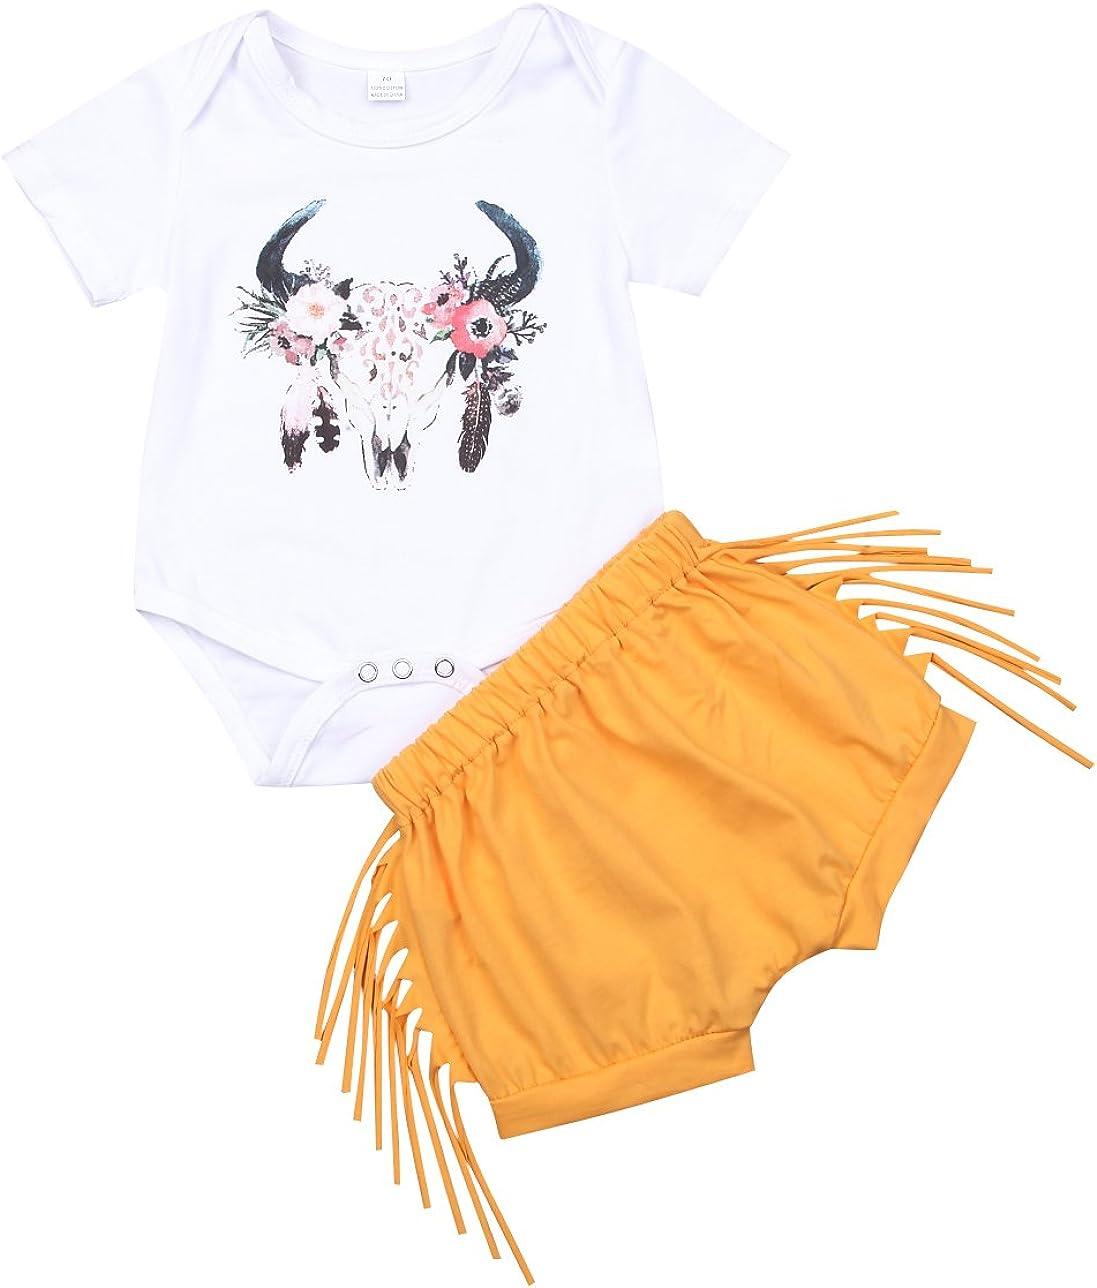 Toddler Kids Baby Girl Deer Short Sleeve Romper Shirt+Tassel Shorts Outfit Set